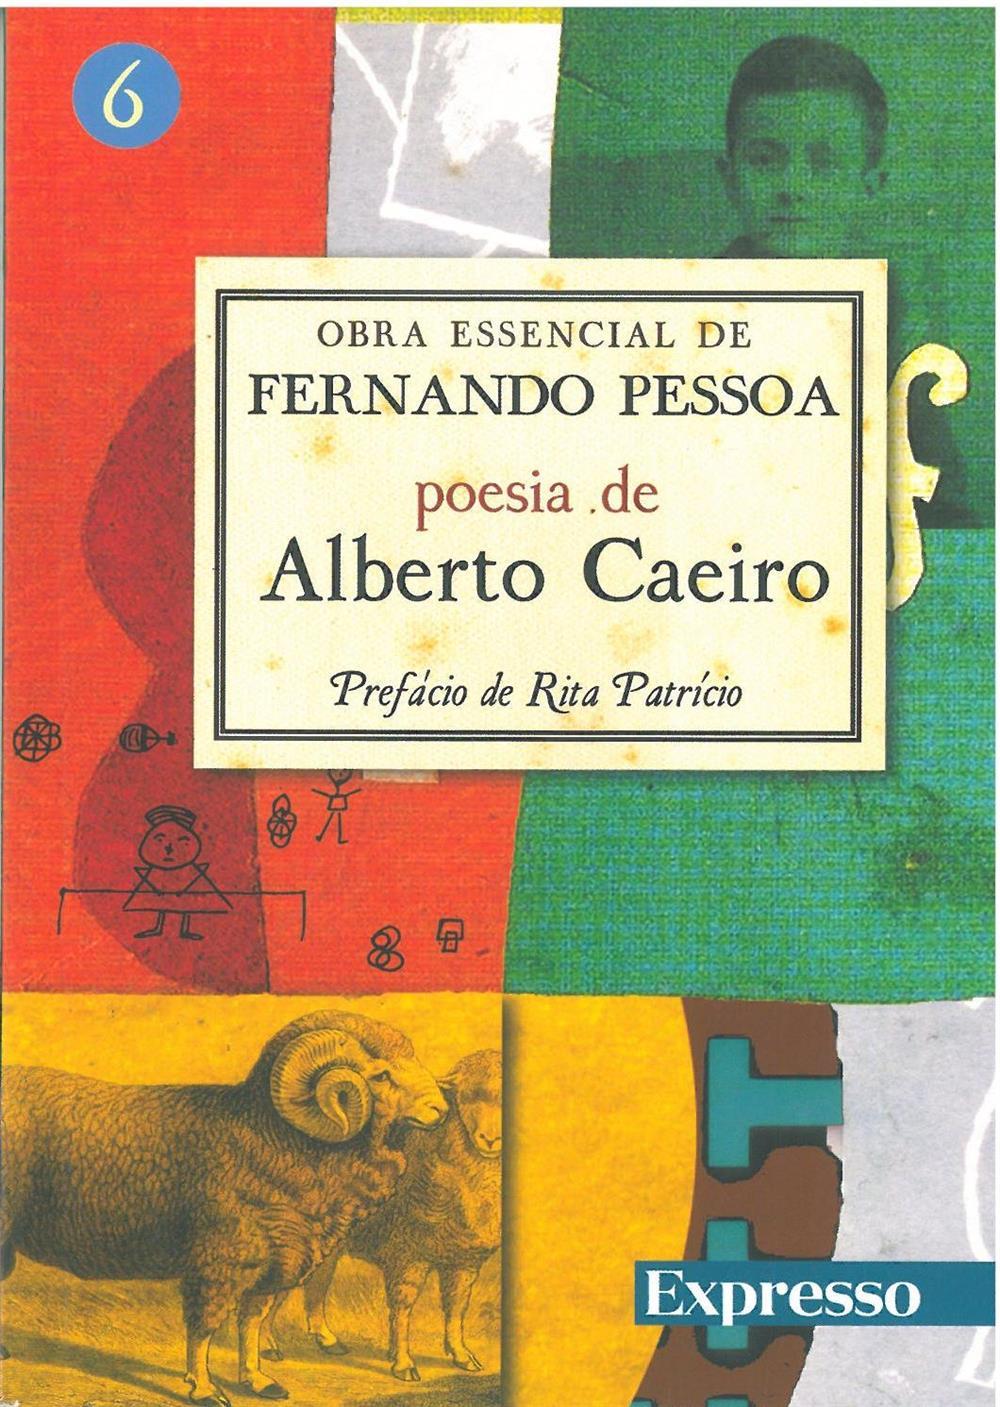 Poesia de Alberto Caeiro_.jpg